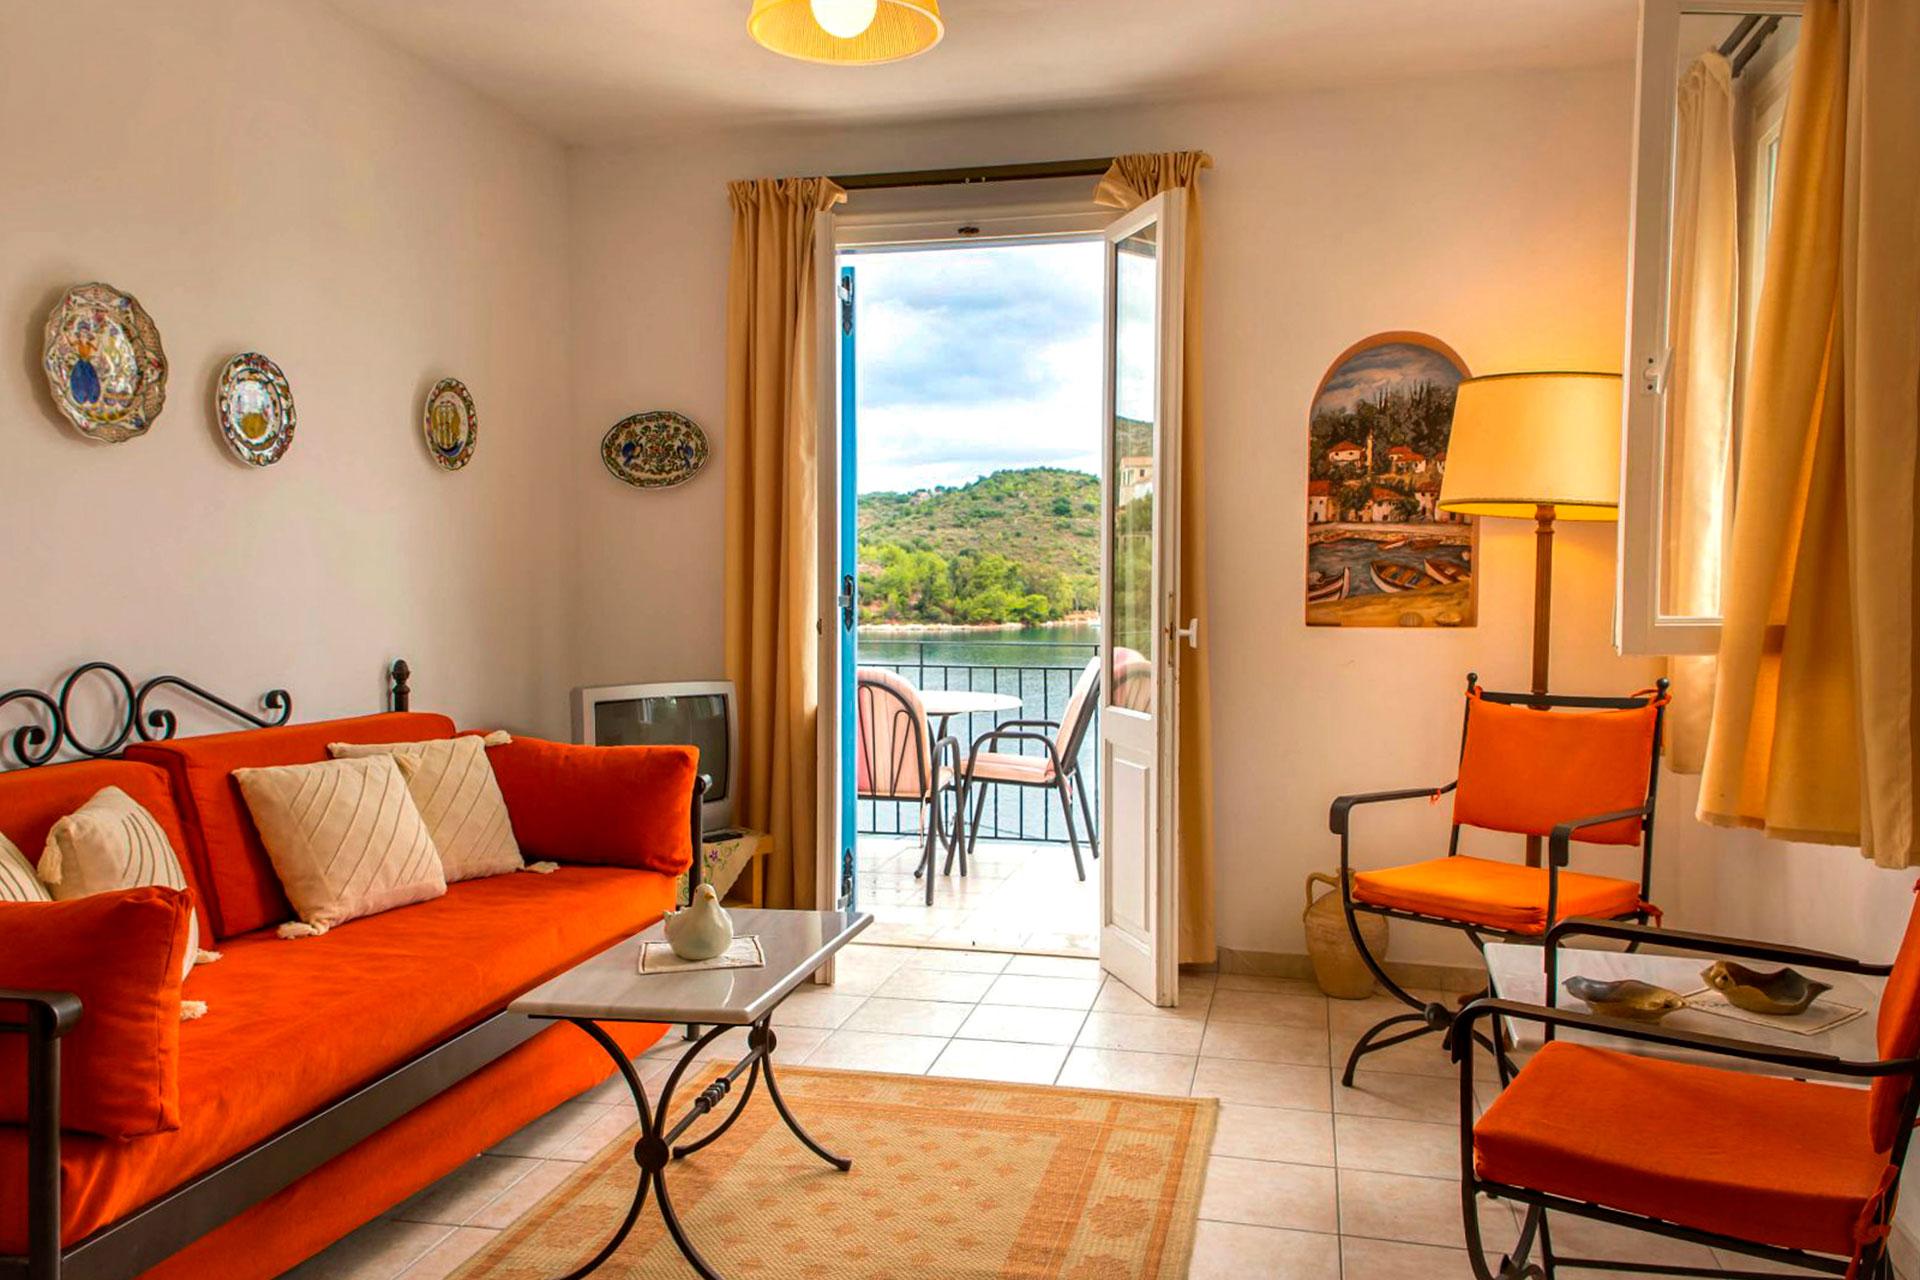 El Greco Hotels - Diouskouri II Hotel